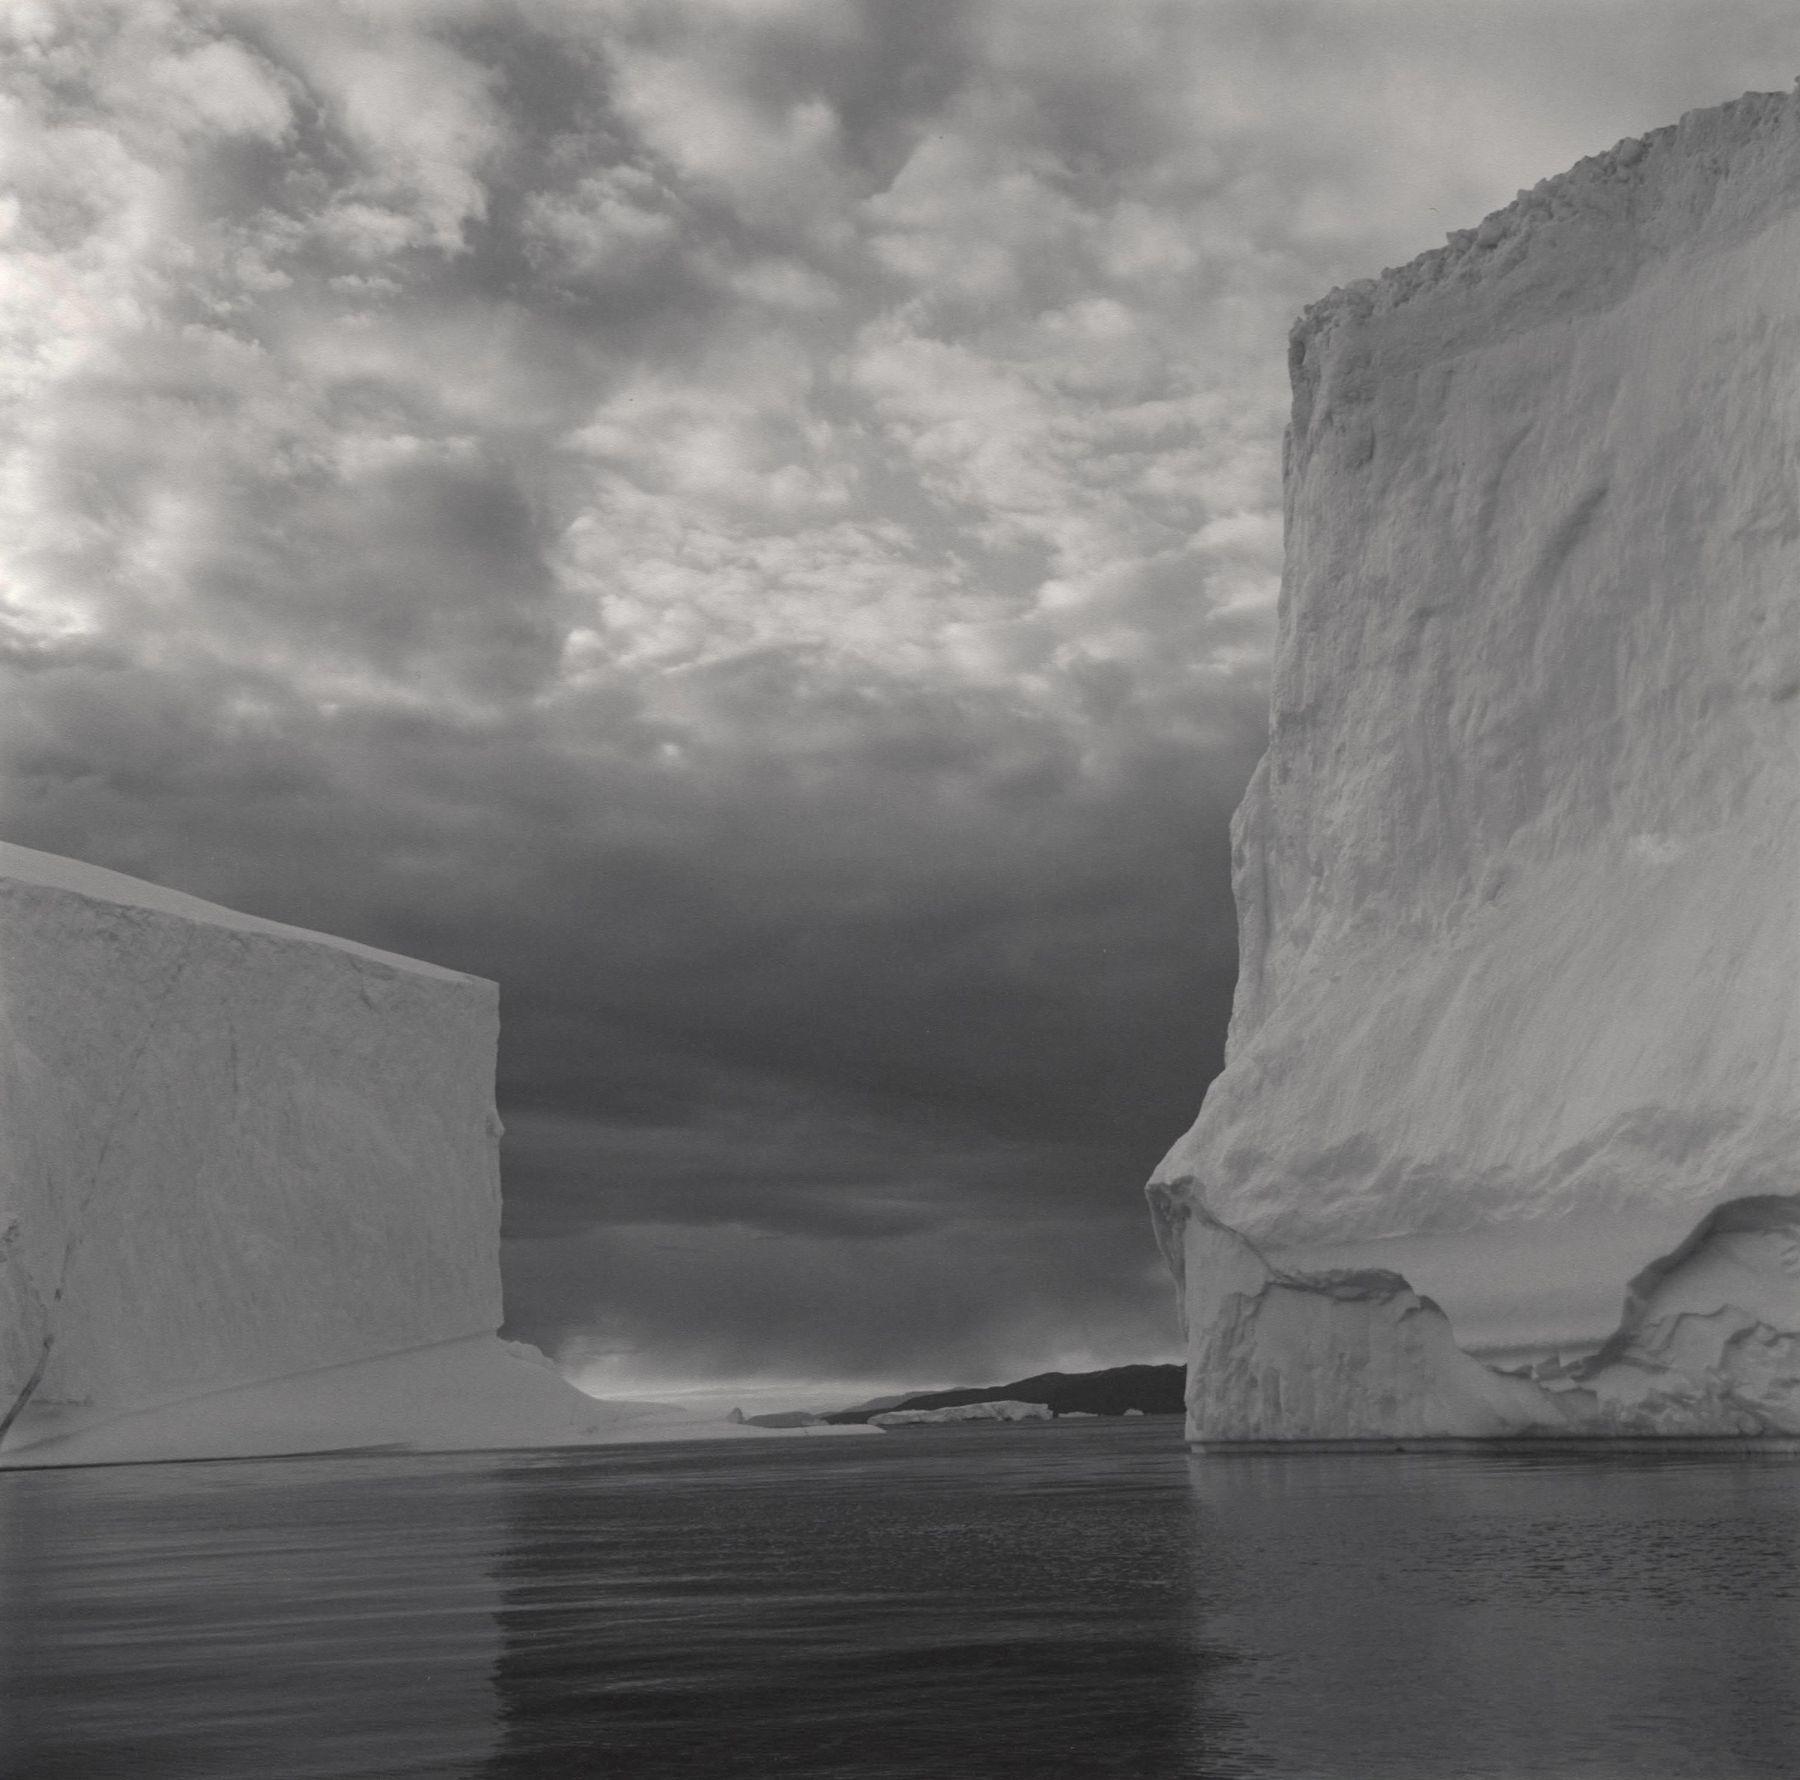 Lynn Davis, Iceberg #23, Disko Bay, Greenland, 2000, Gelatin silver print, 40 x 40 inches